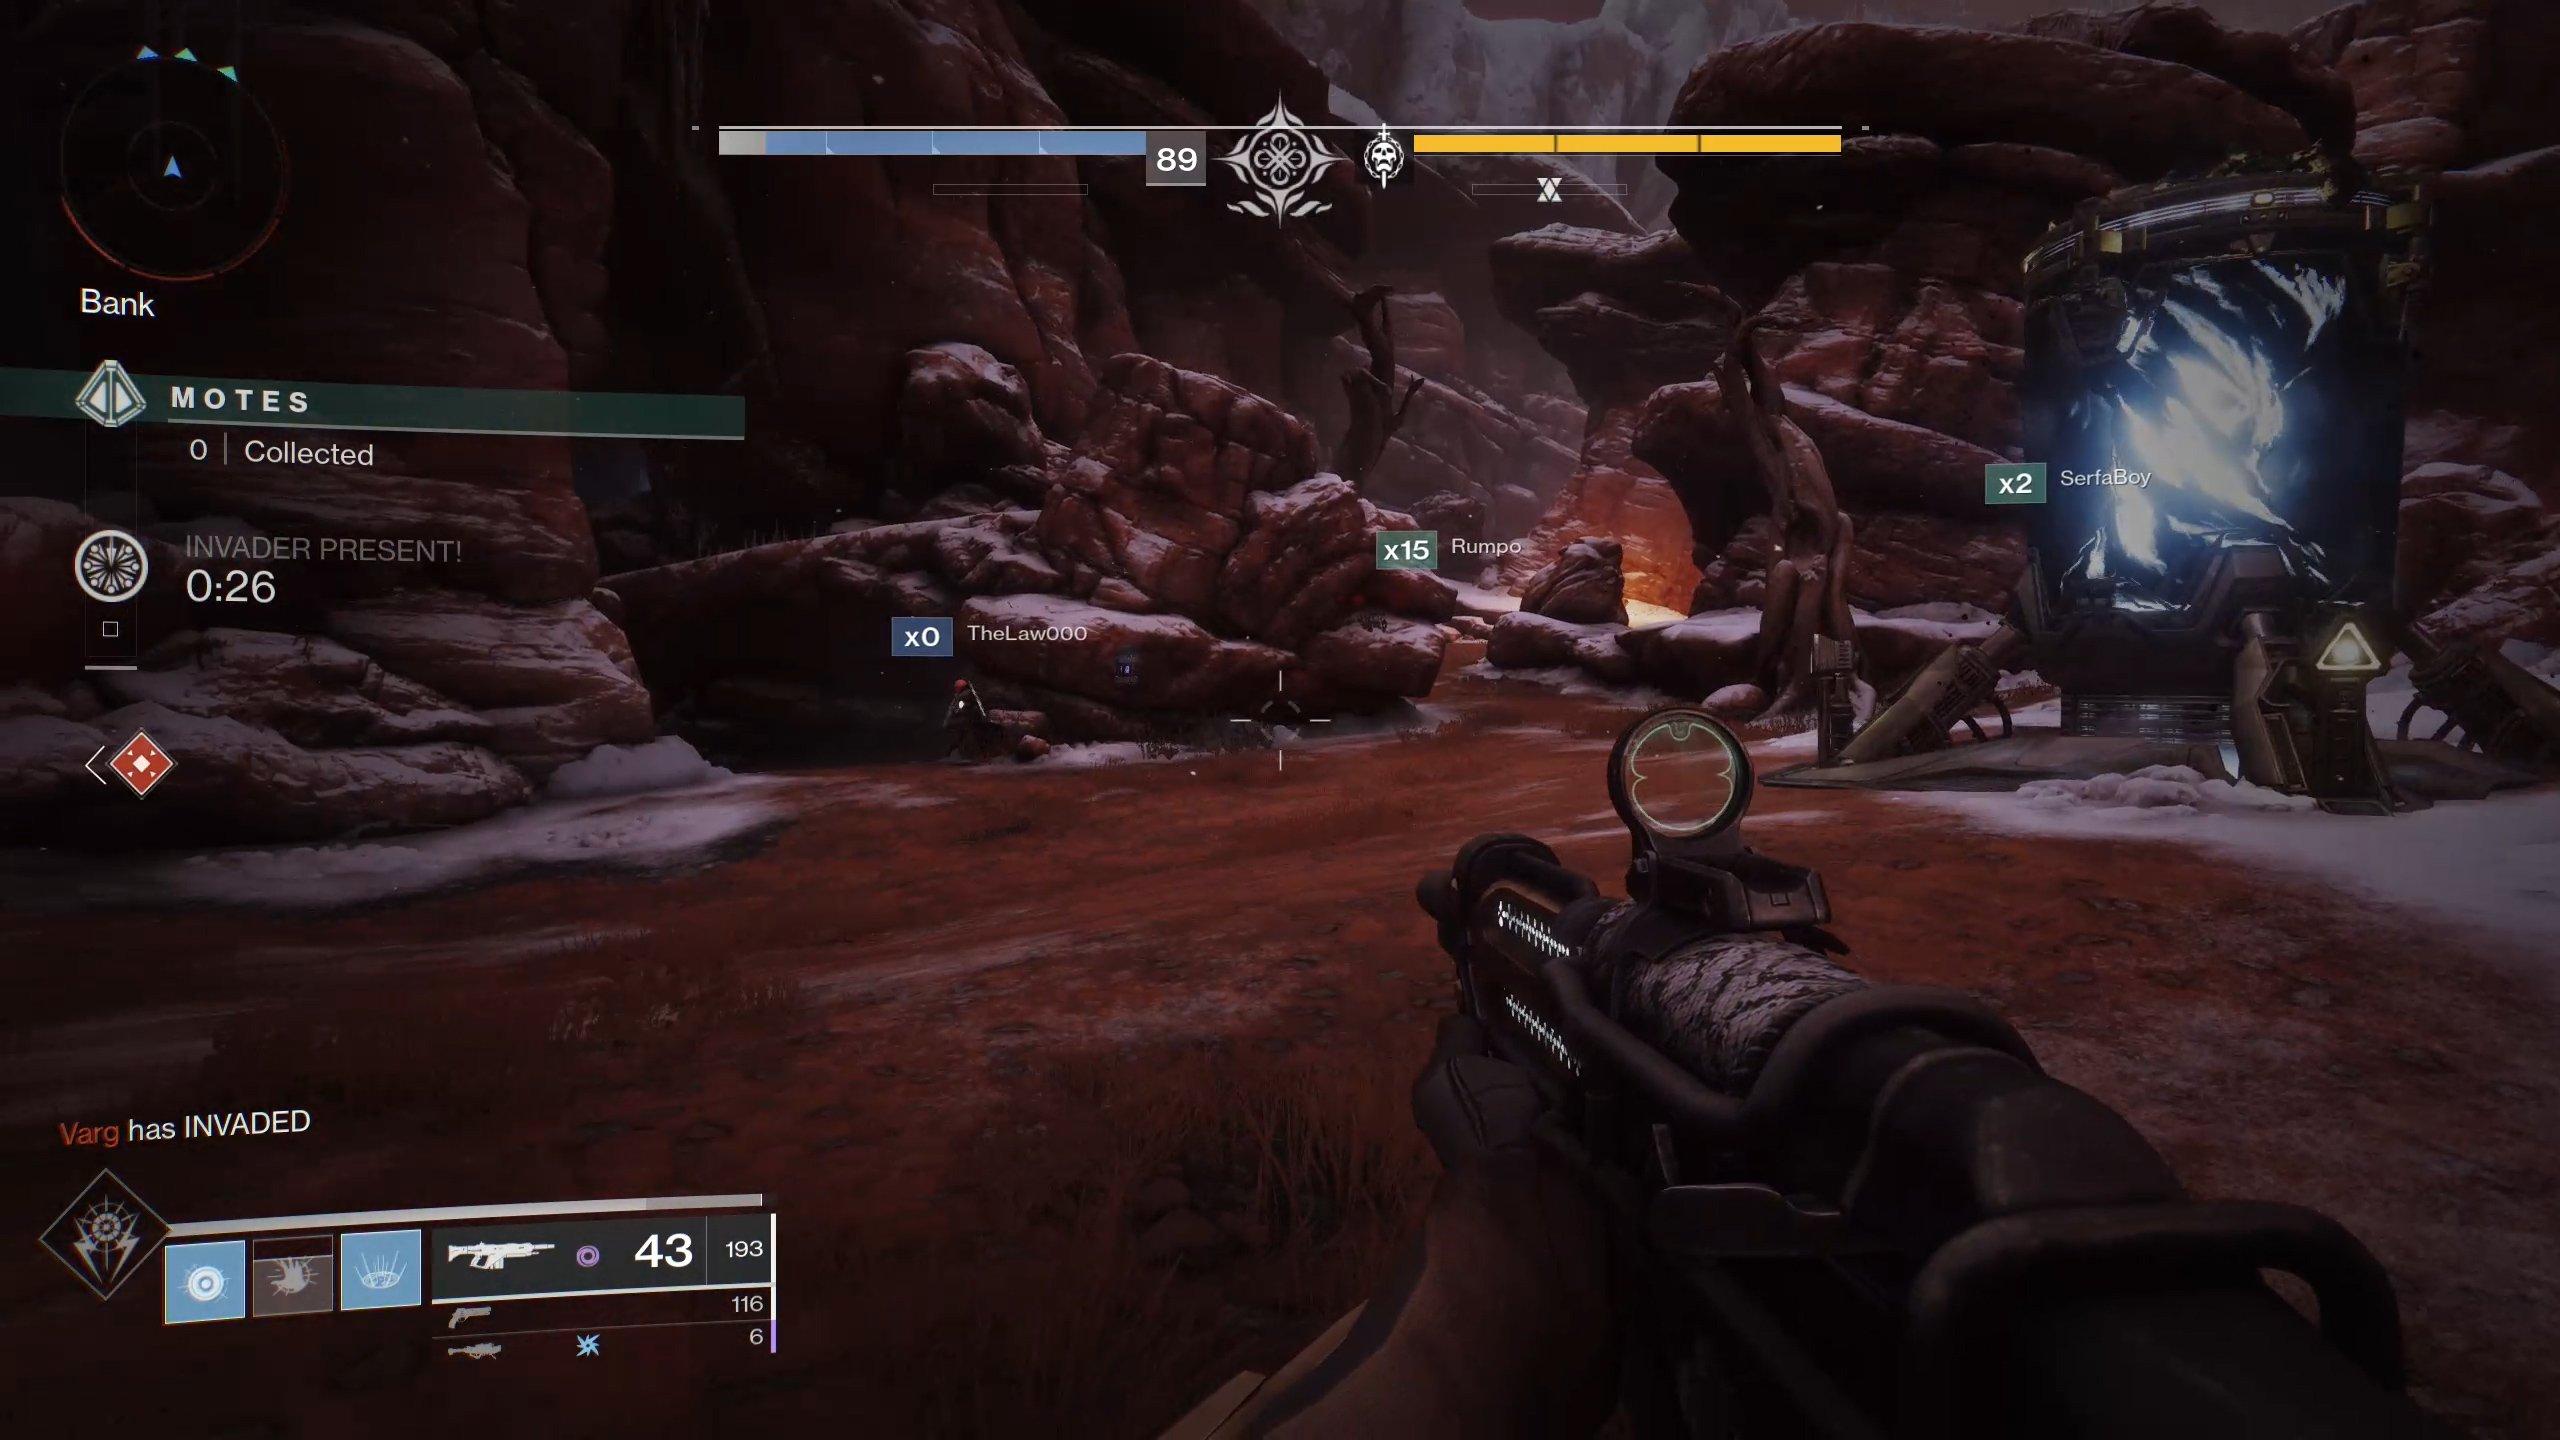 Destiny 2 Gambit Prime invader active